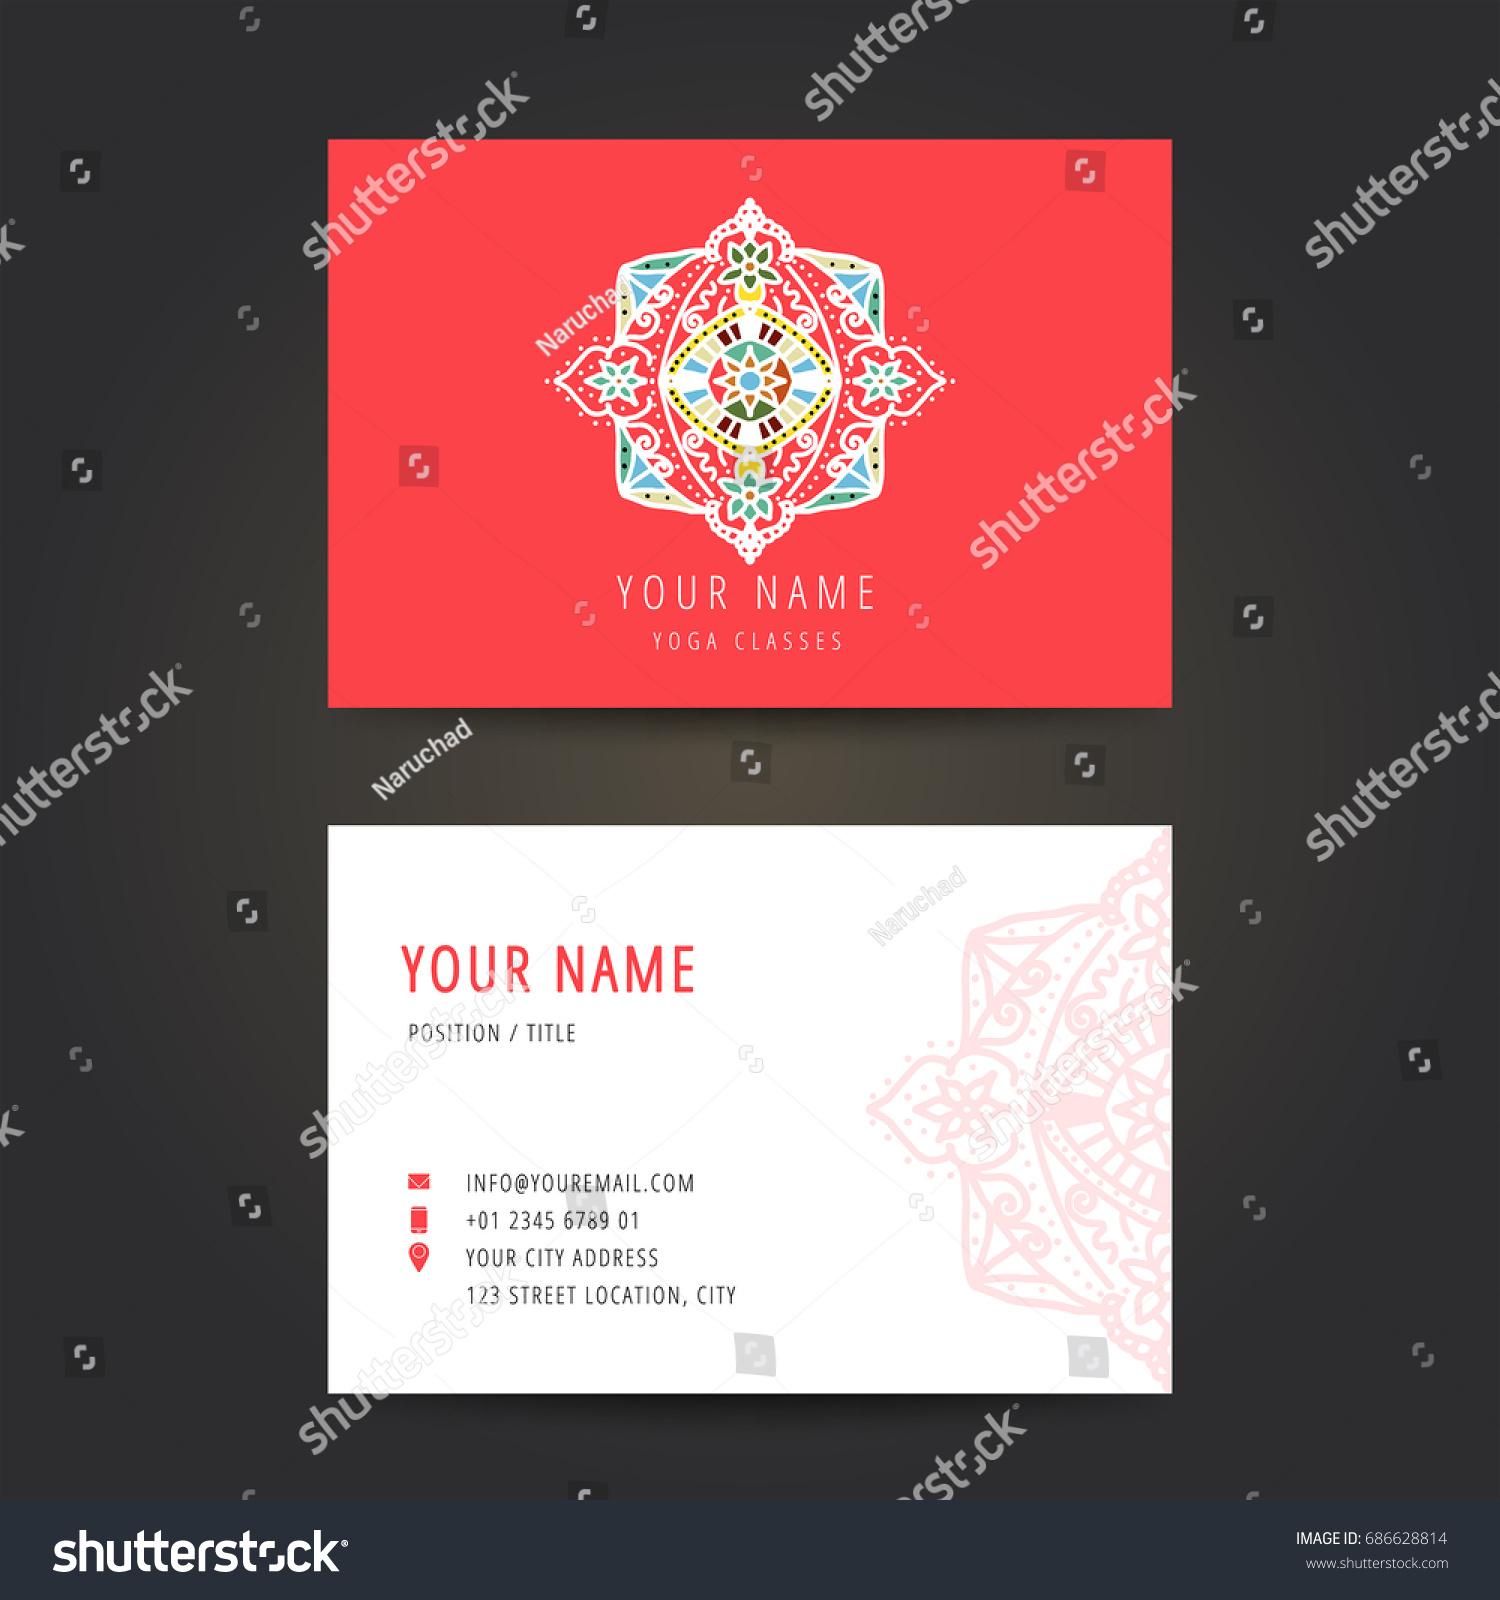 Design Template Yoga Studio Business Card Stock Vector